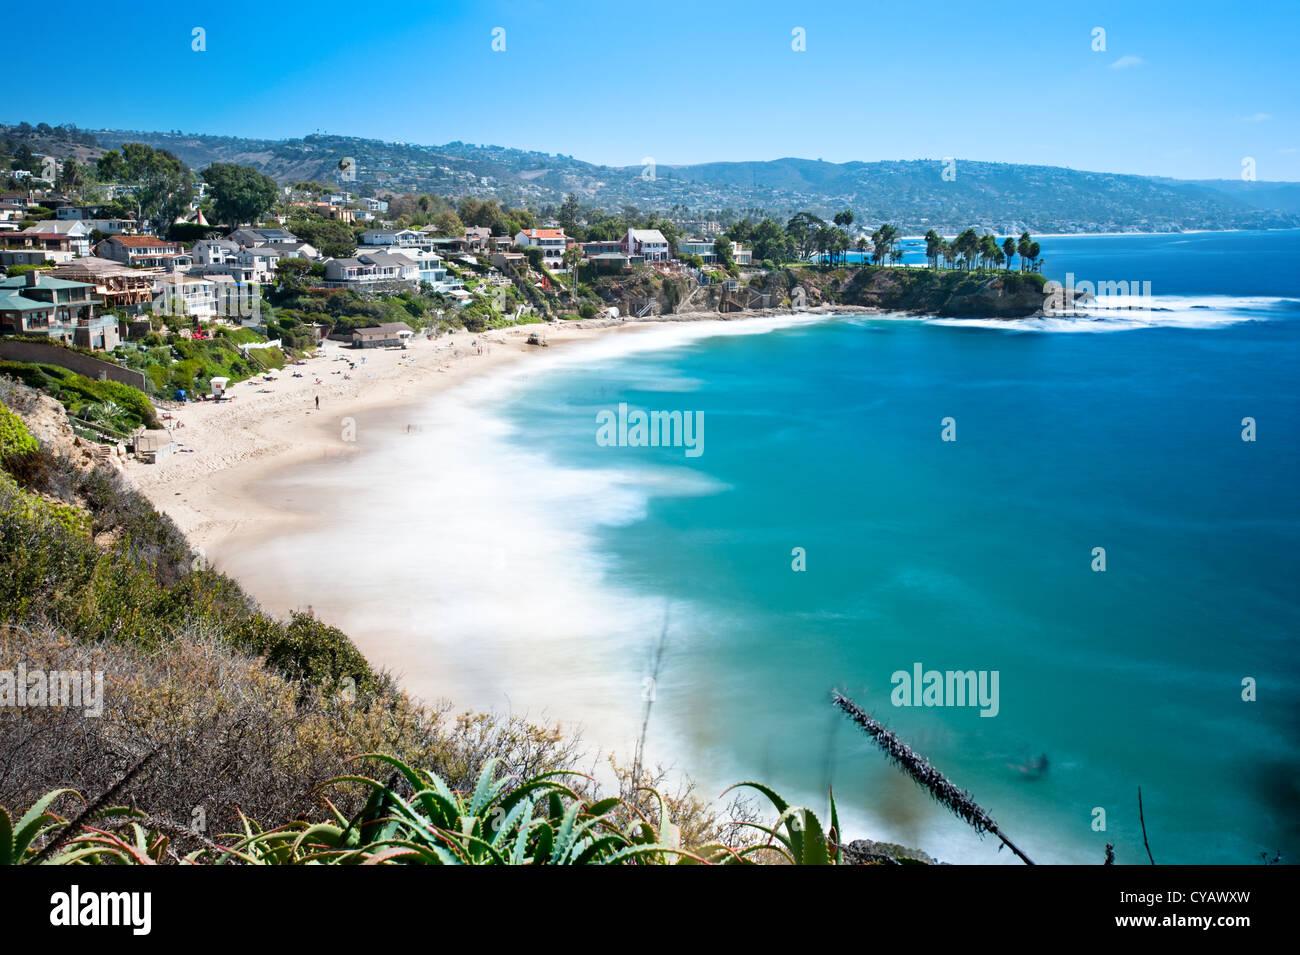 An image of a beautiful cove called Crescent Bay in Laguna Beach, California. - Stock Image